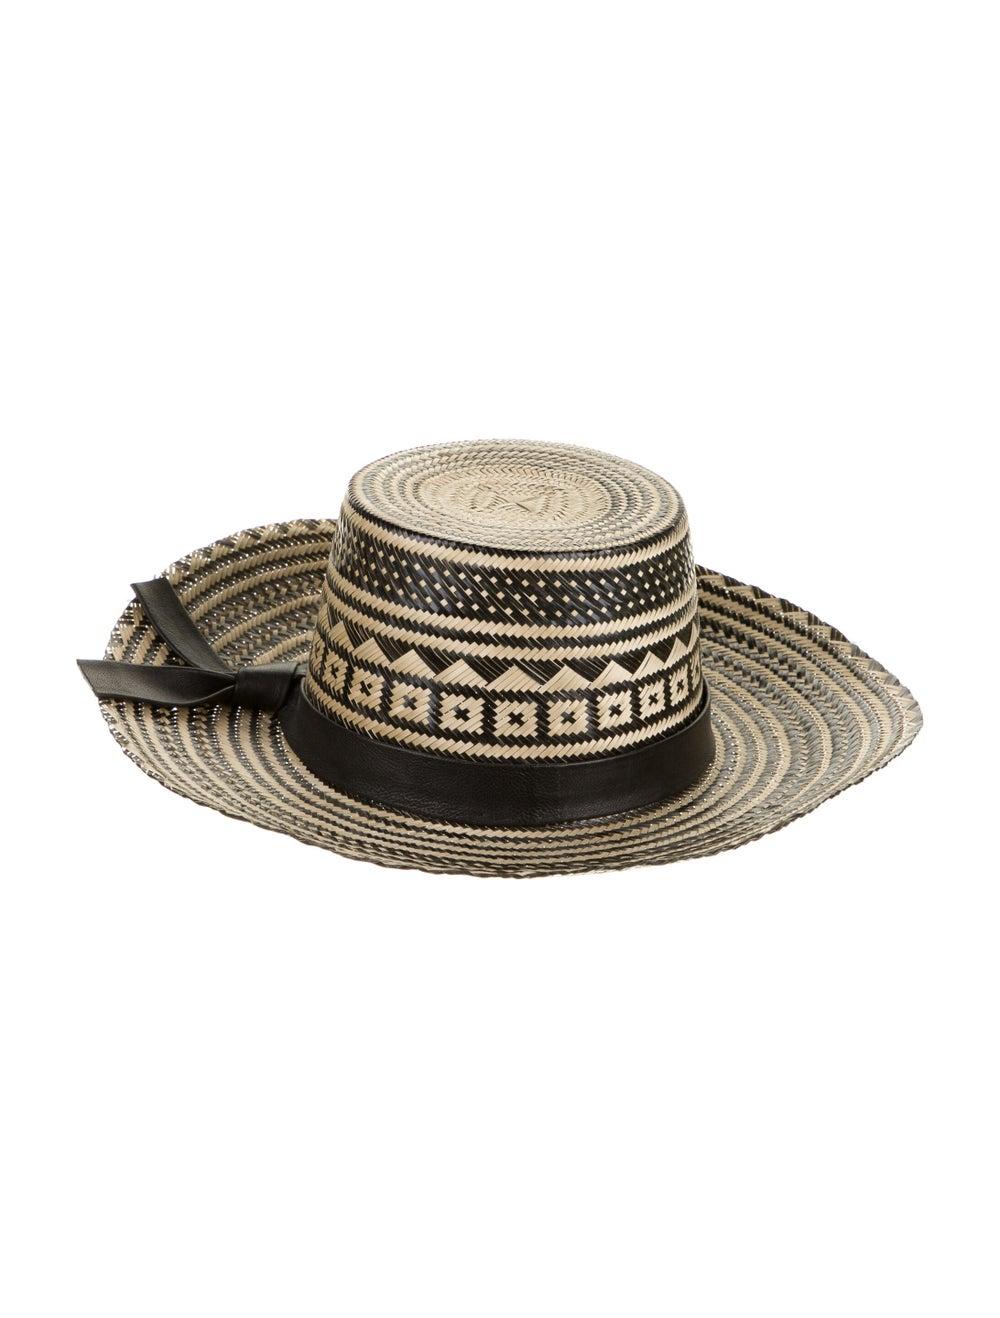 Yosuzi Straw Wide-Brim Hat Tan - image 2